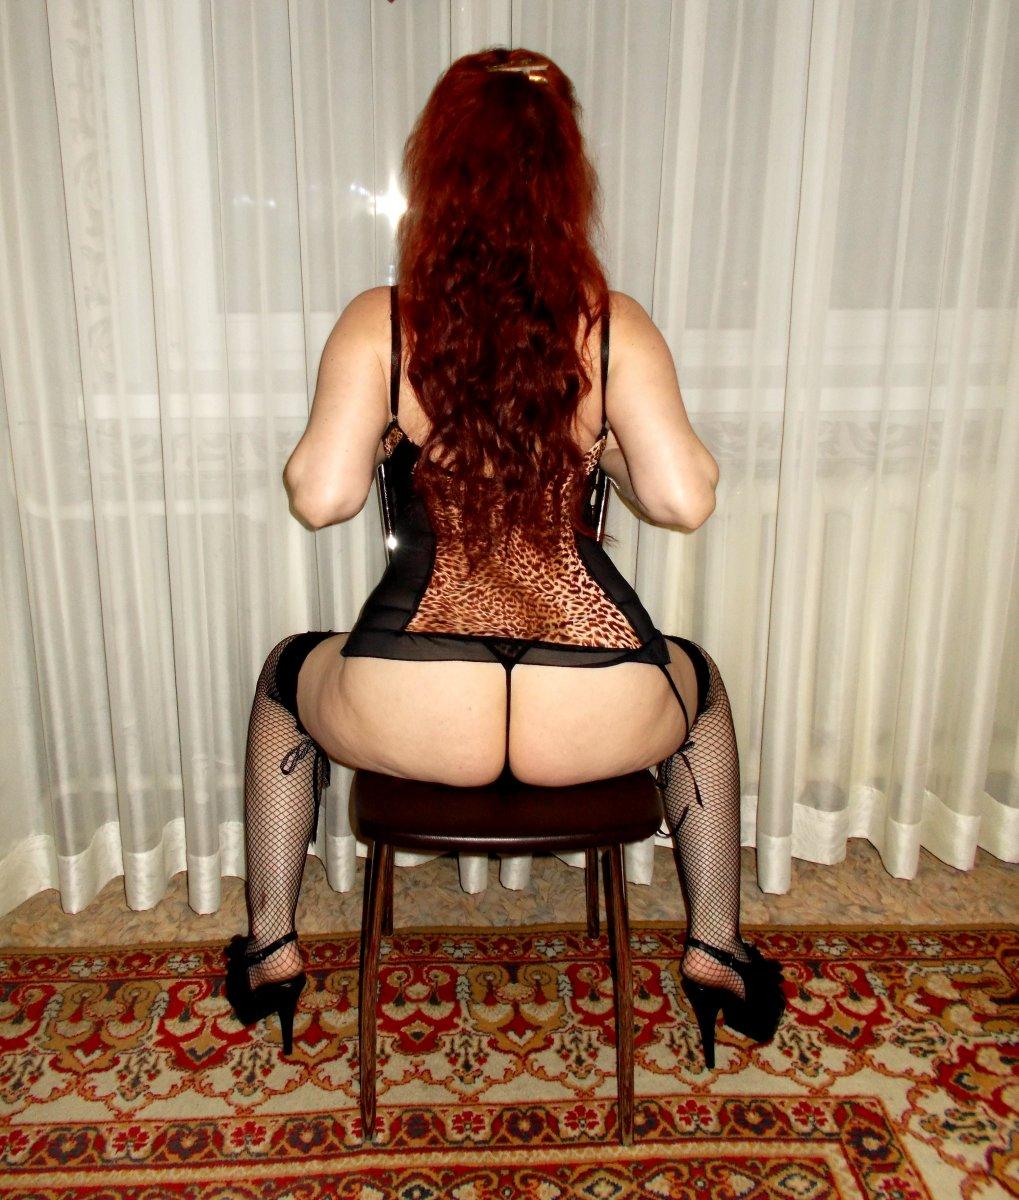 жирные проститутки онлайн